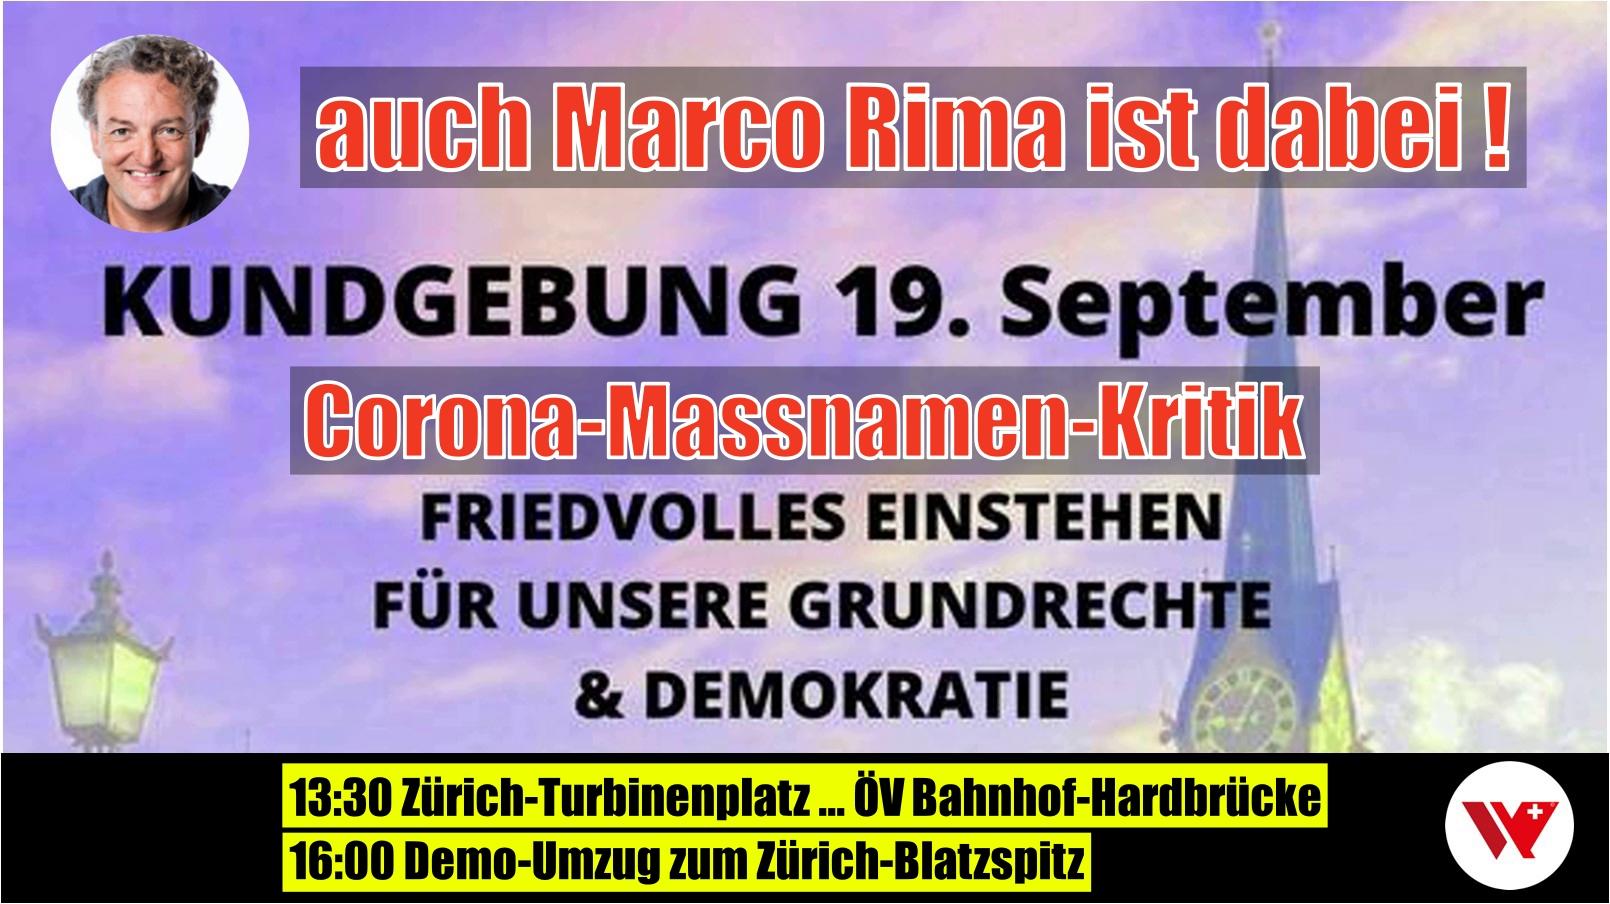 CH-ZH_Zuerich_turbinenplatz_19-09-2020_169_05